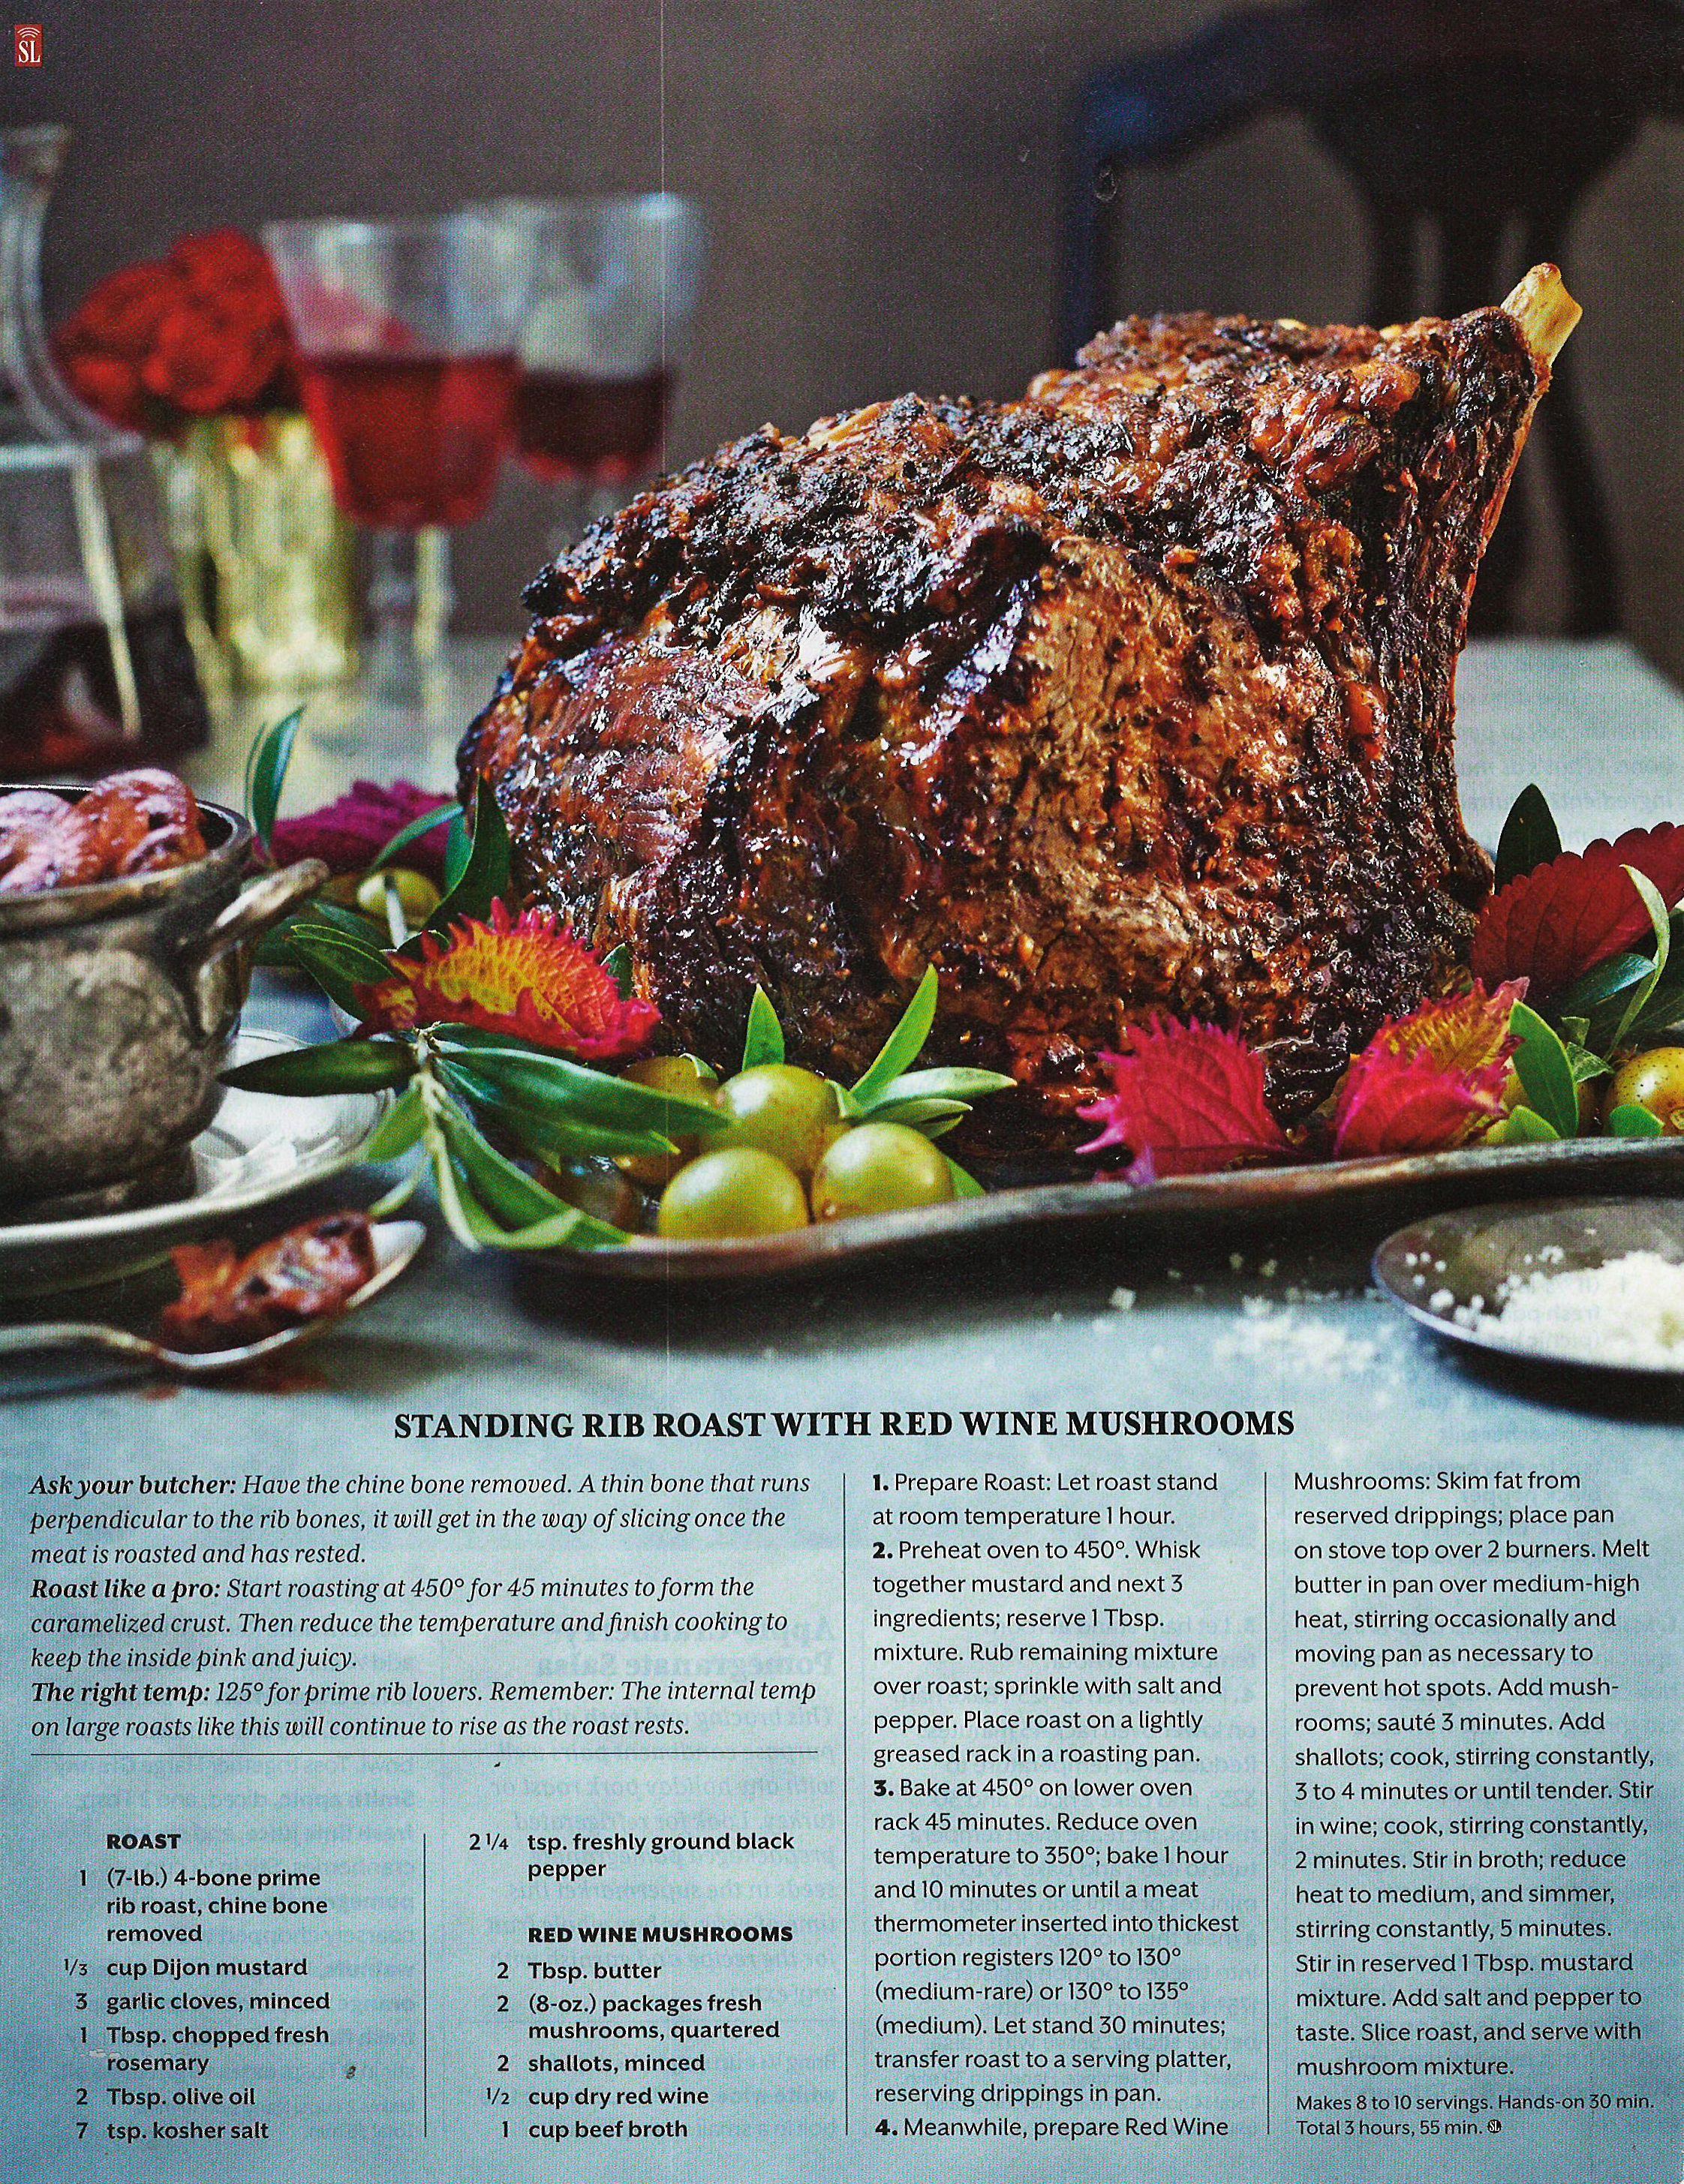 Standing Rib Roast With Red Wine Mushrooms | Holiday Food ...